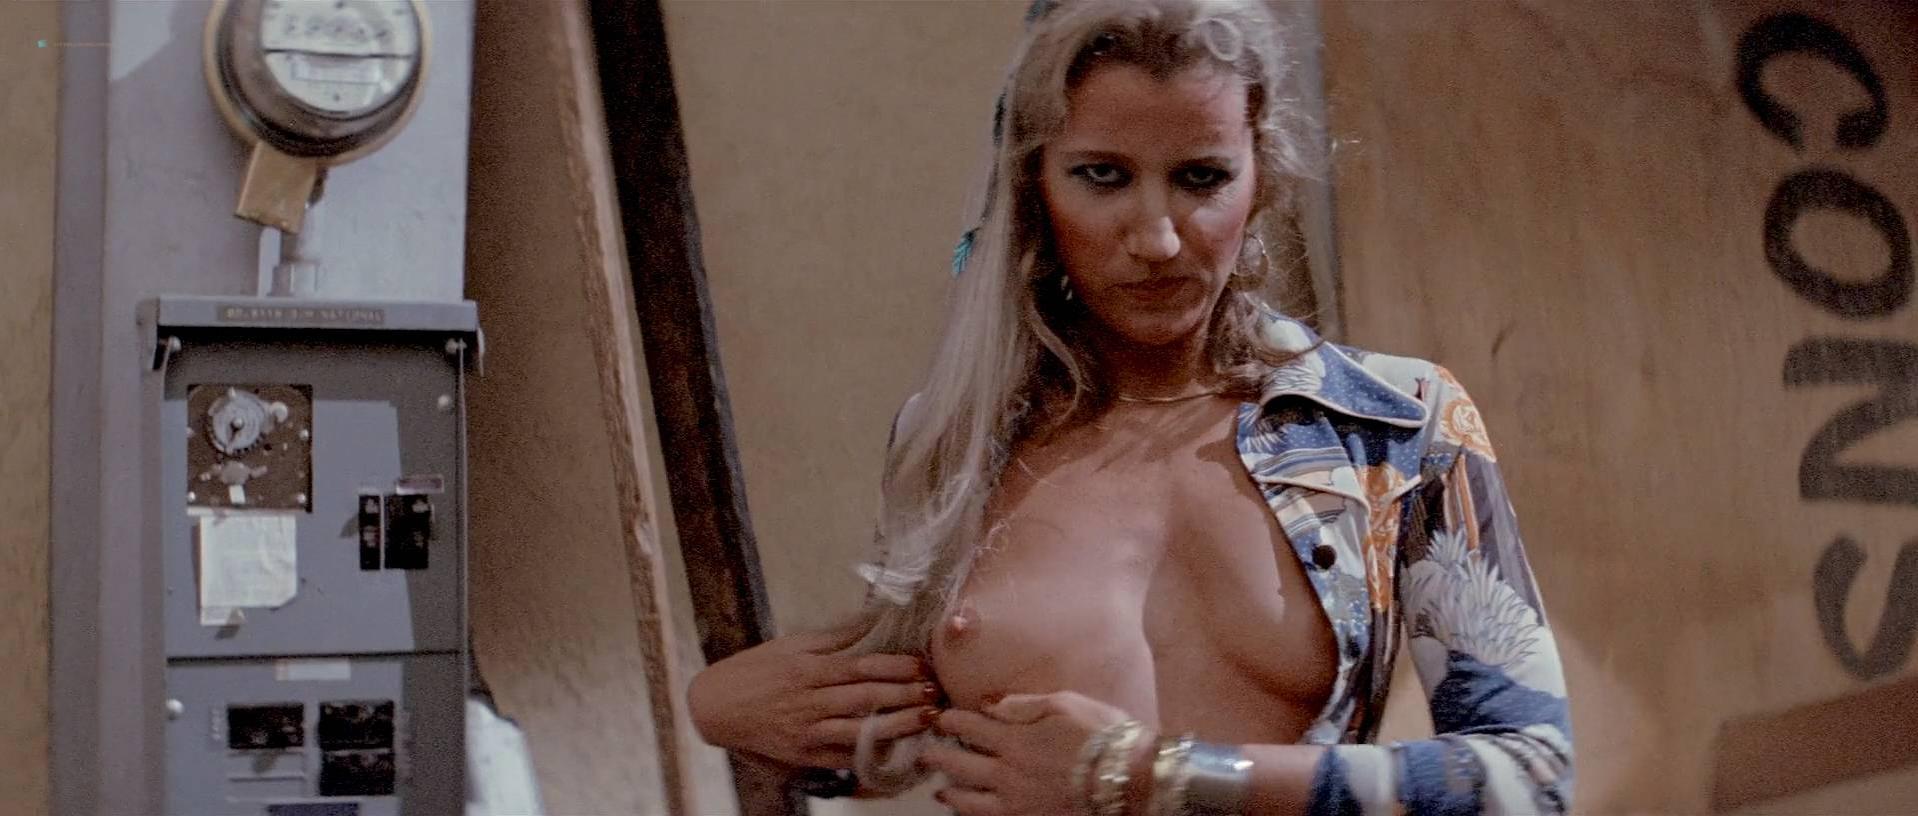 Sally Kirkland nude, Jeana Tomasina nude, Teressa Macky nude, Joanna Pettet nude, Kathy Shower sexy - Double Exposure (1983)